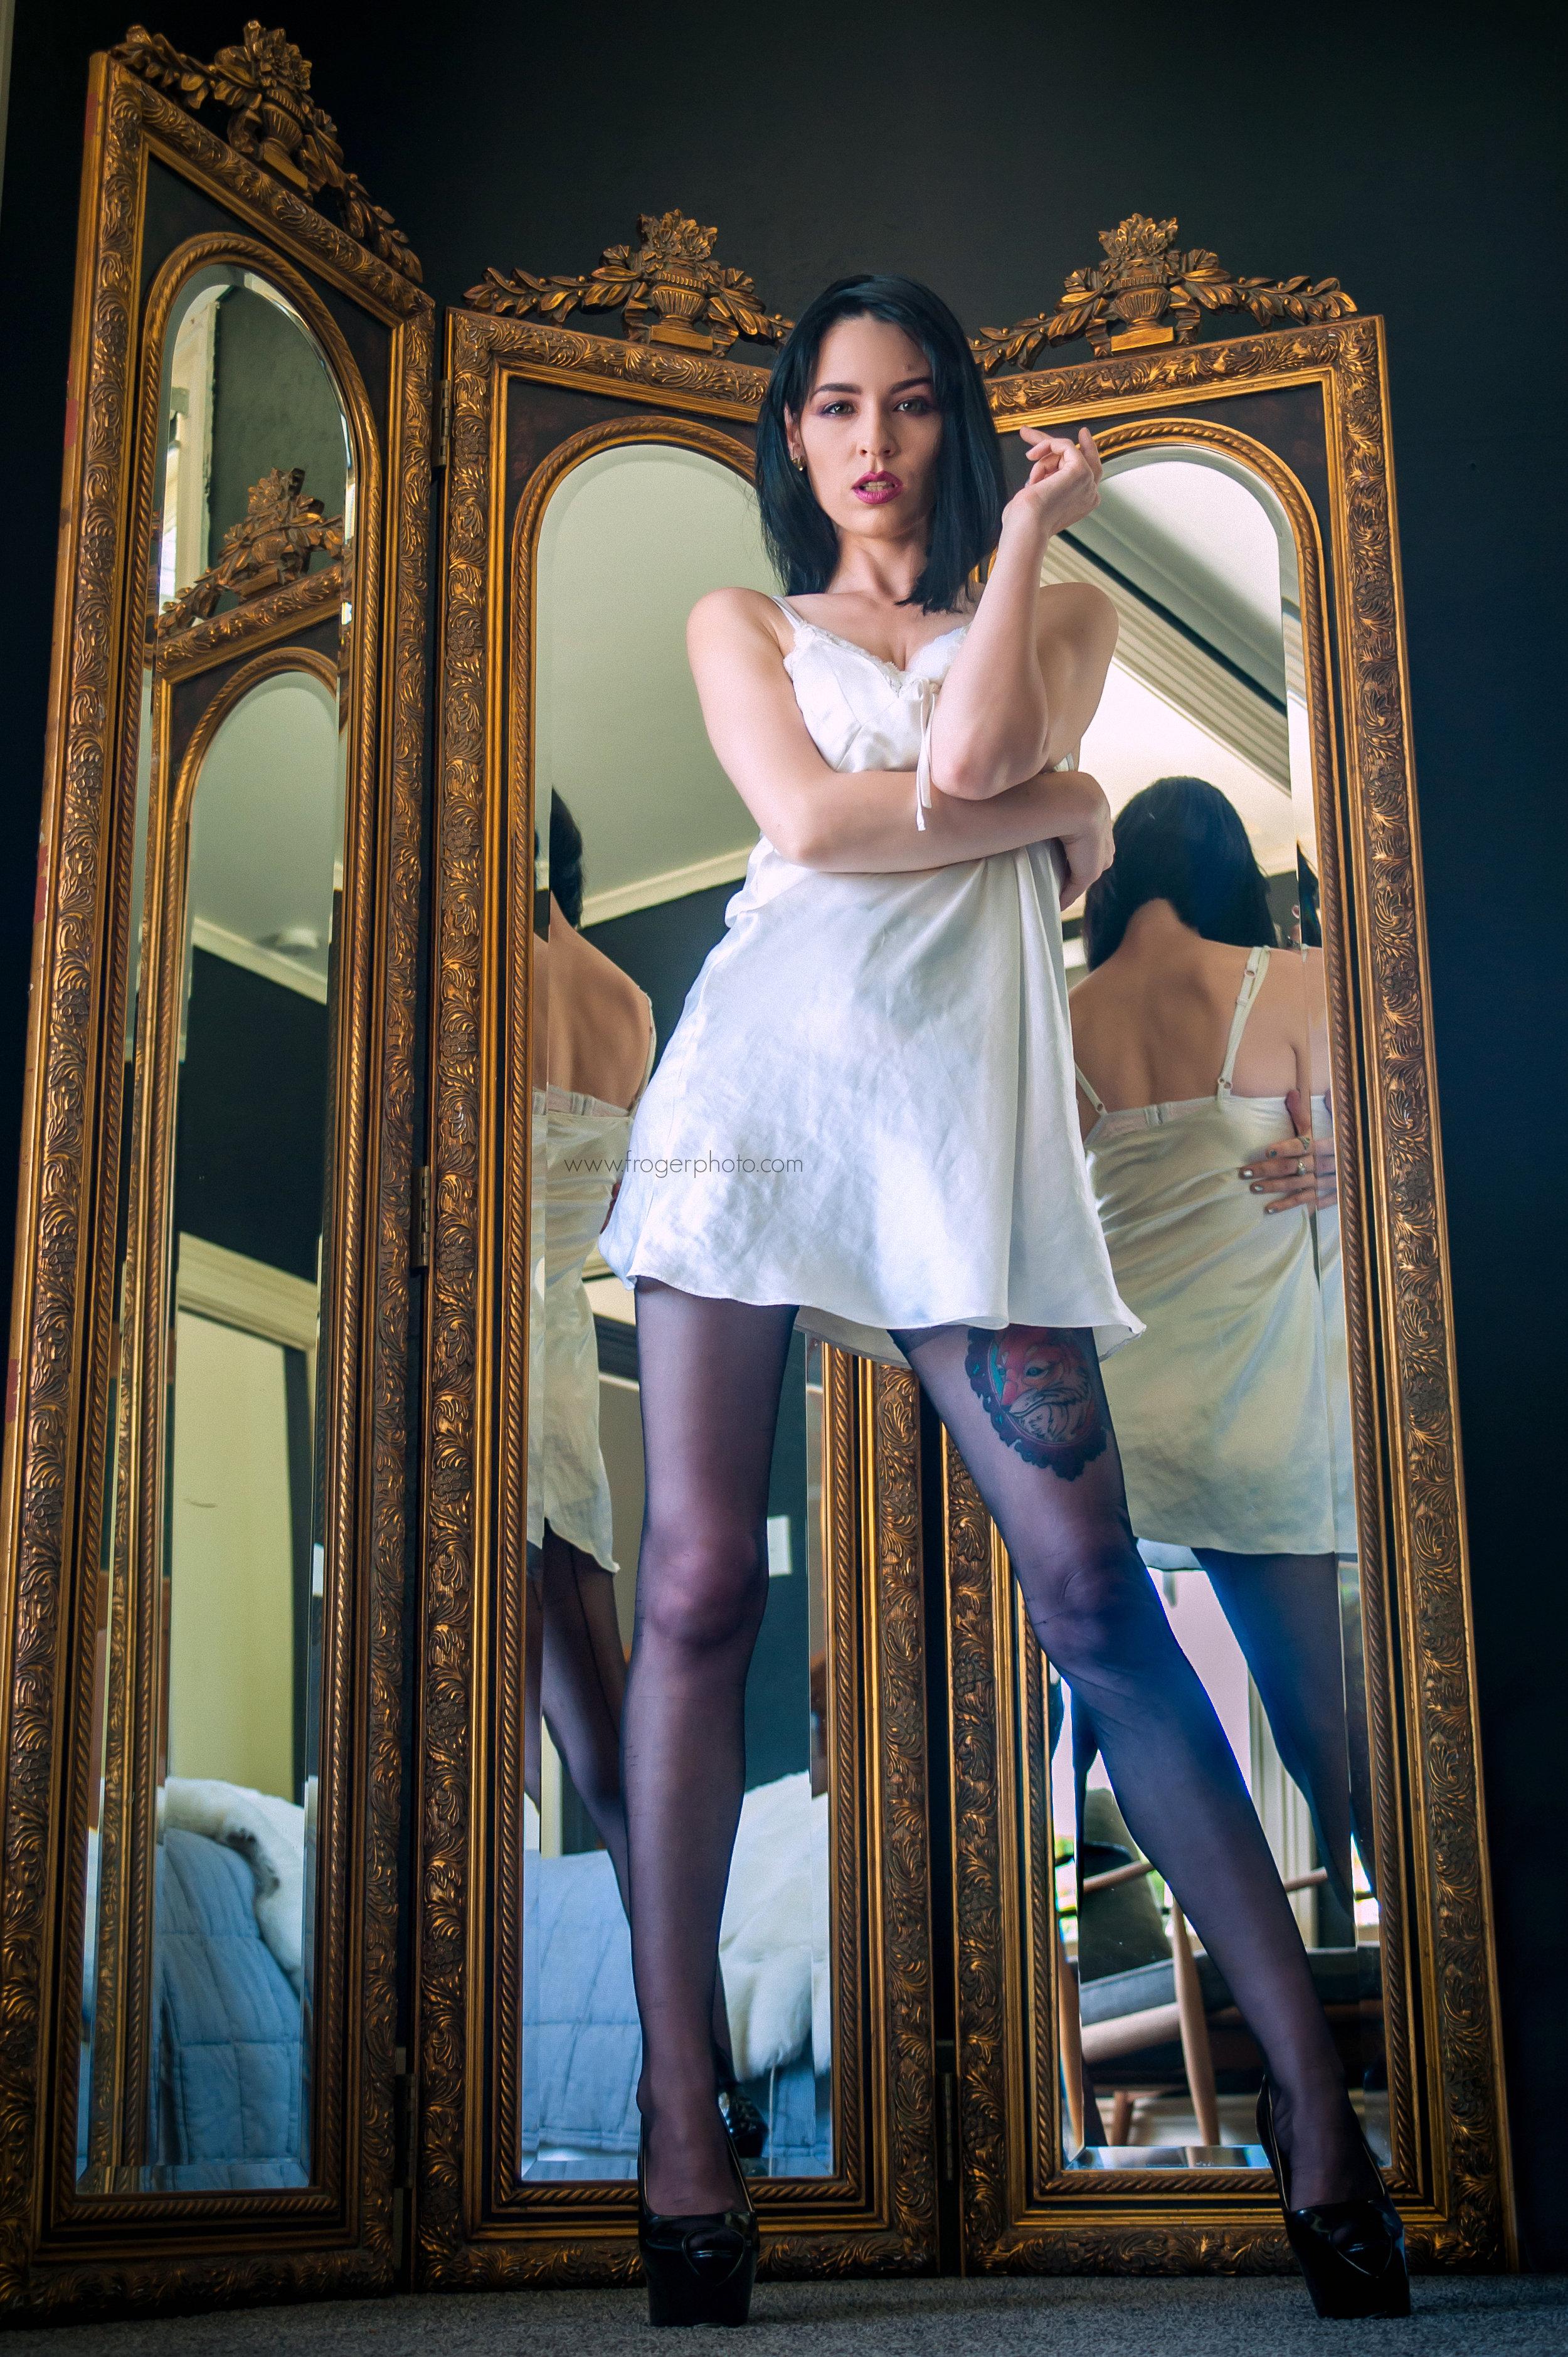 Nicole - Mirror Mirror - Uploaded Dec 16th